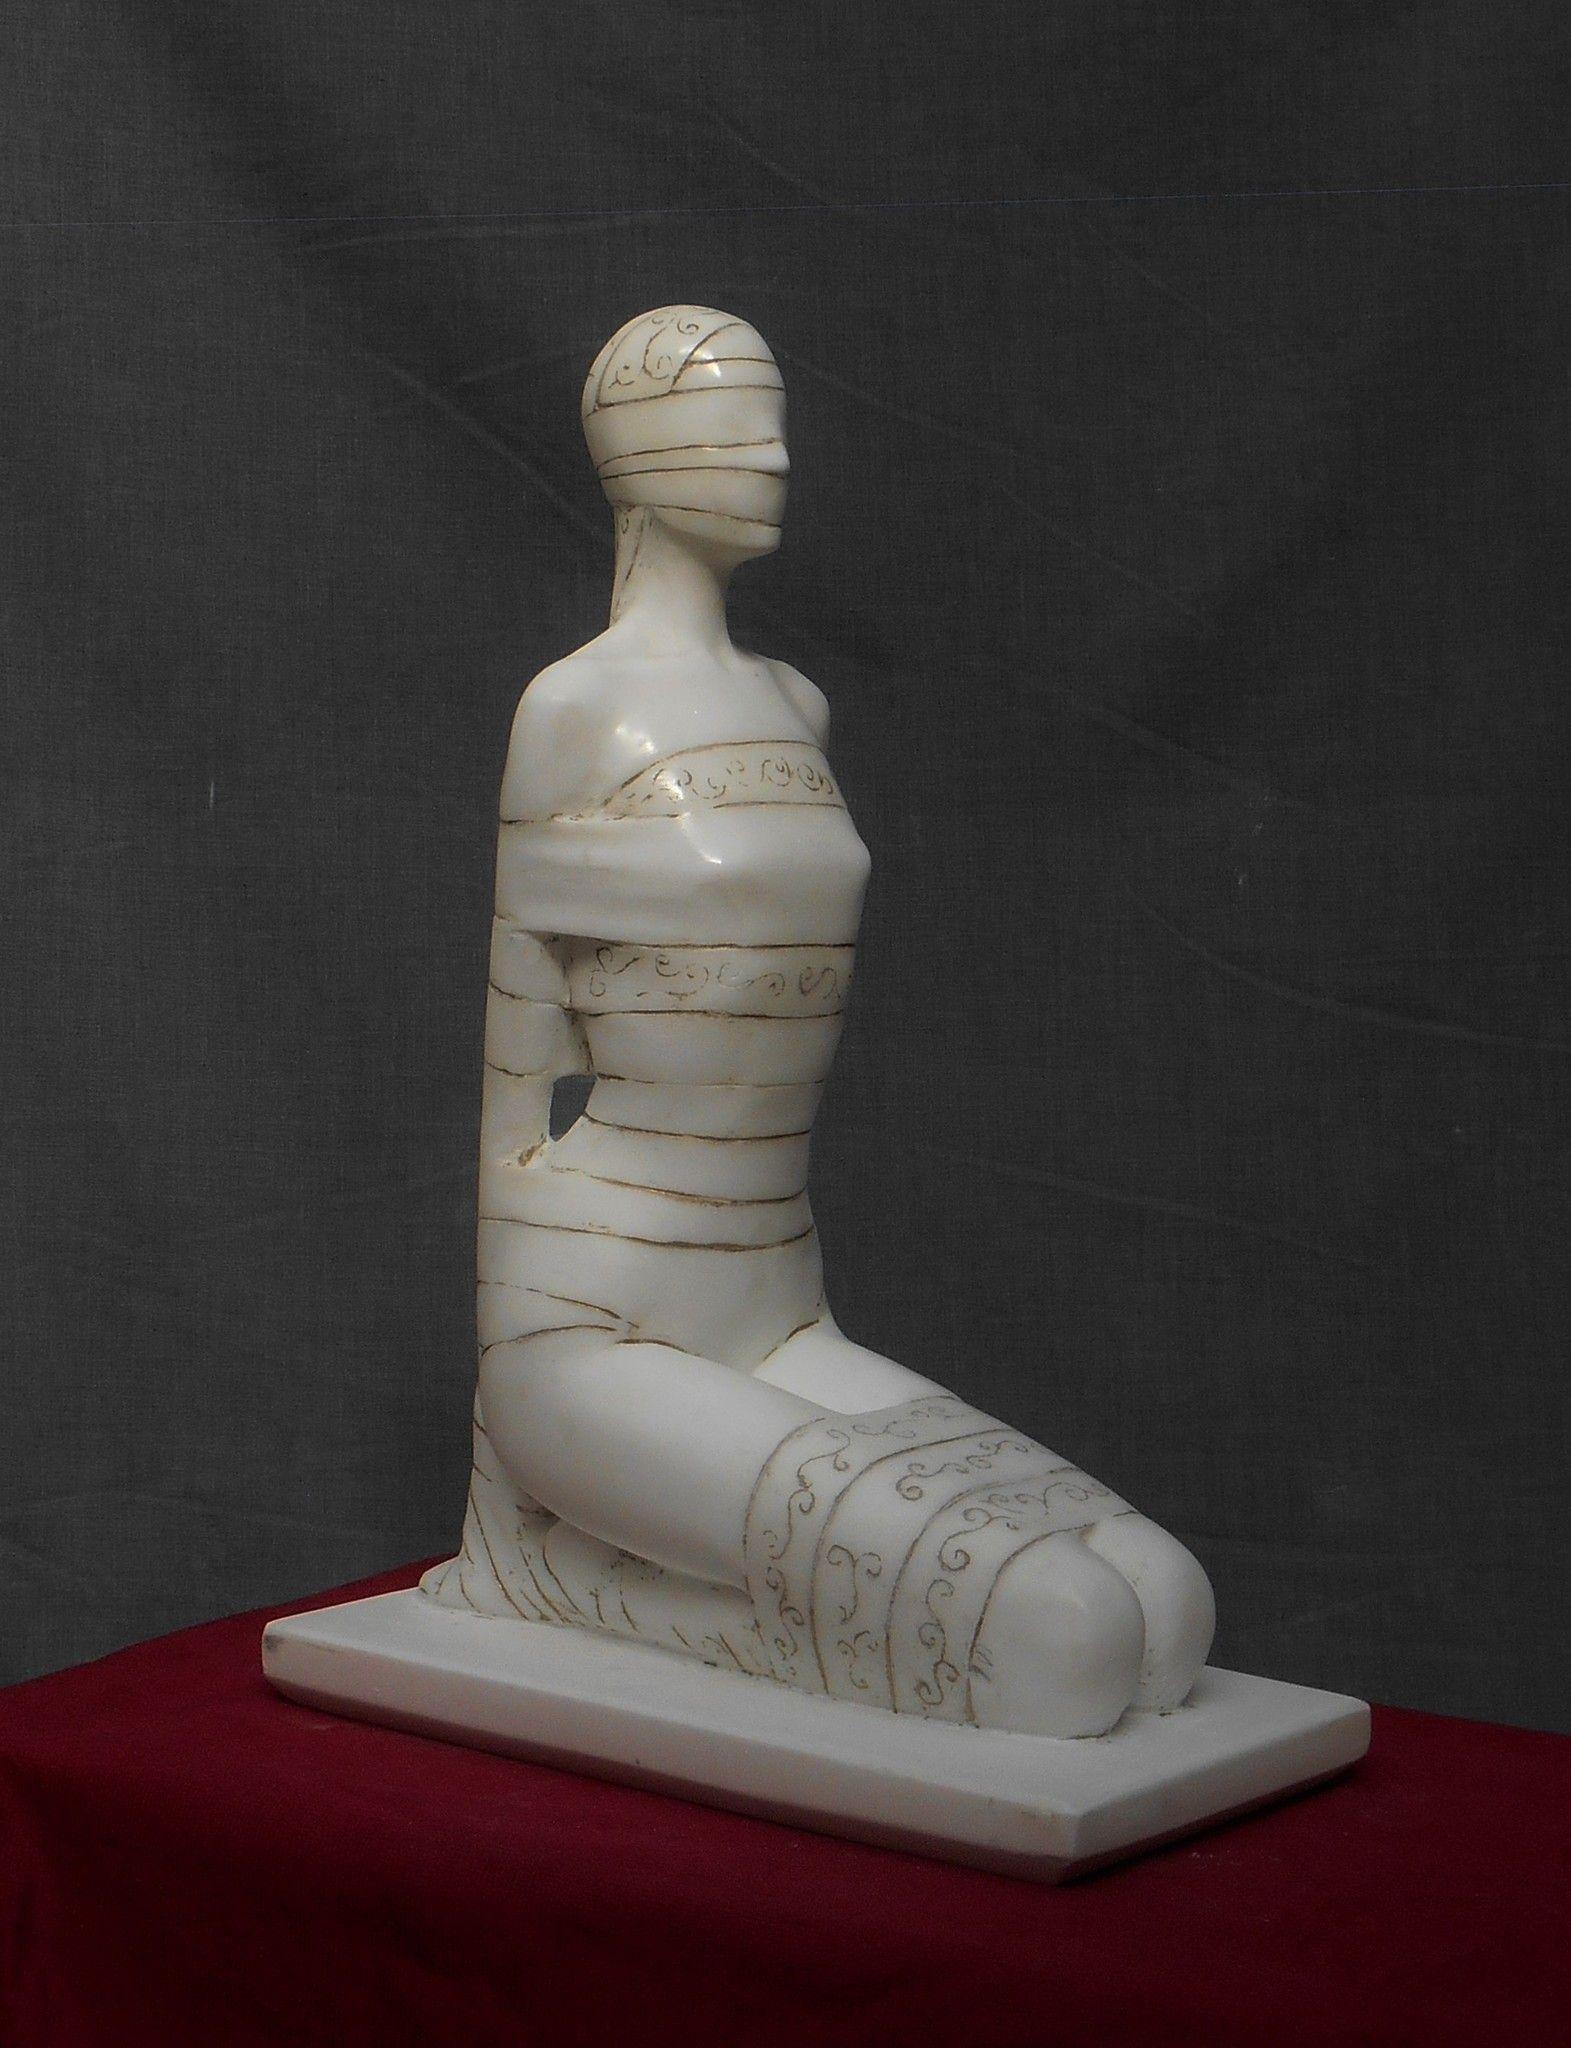 "SCULTURA IN MARMO SMAIL ZIZI "" TABU' 1 ""  dimensioni L 32 x H 45 x P 17 cm."